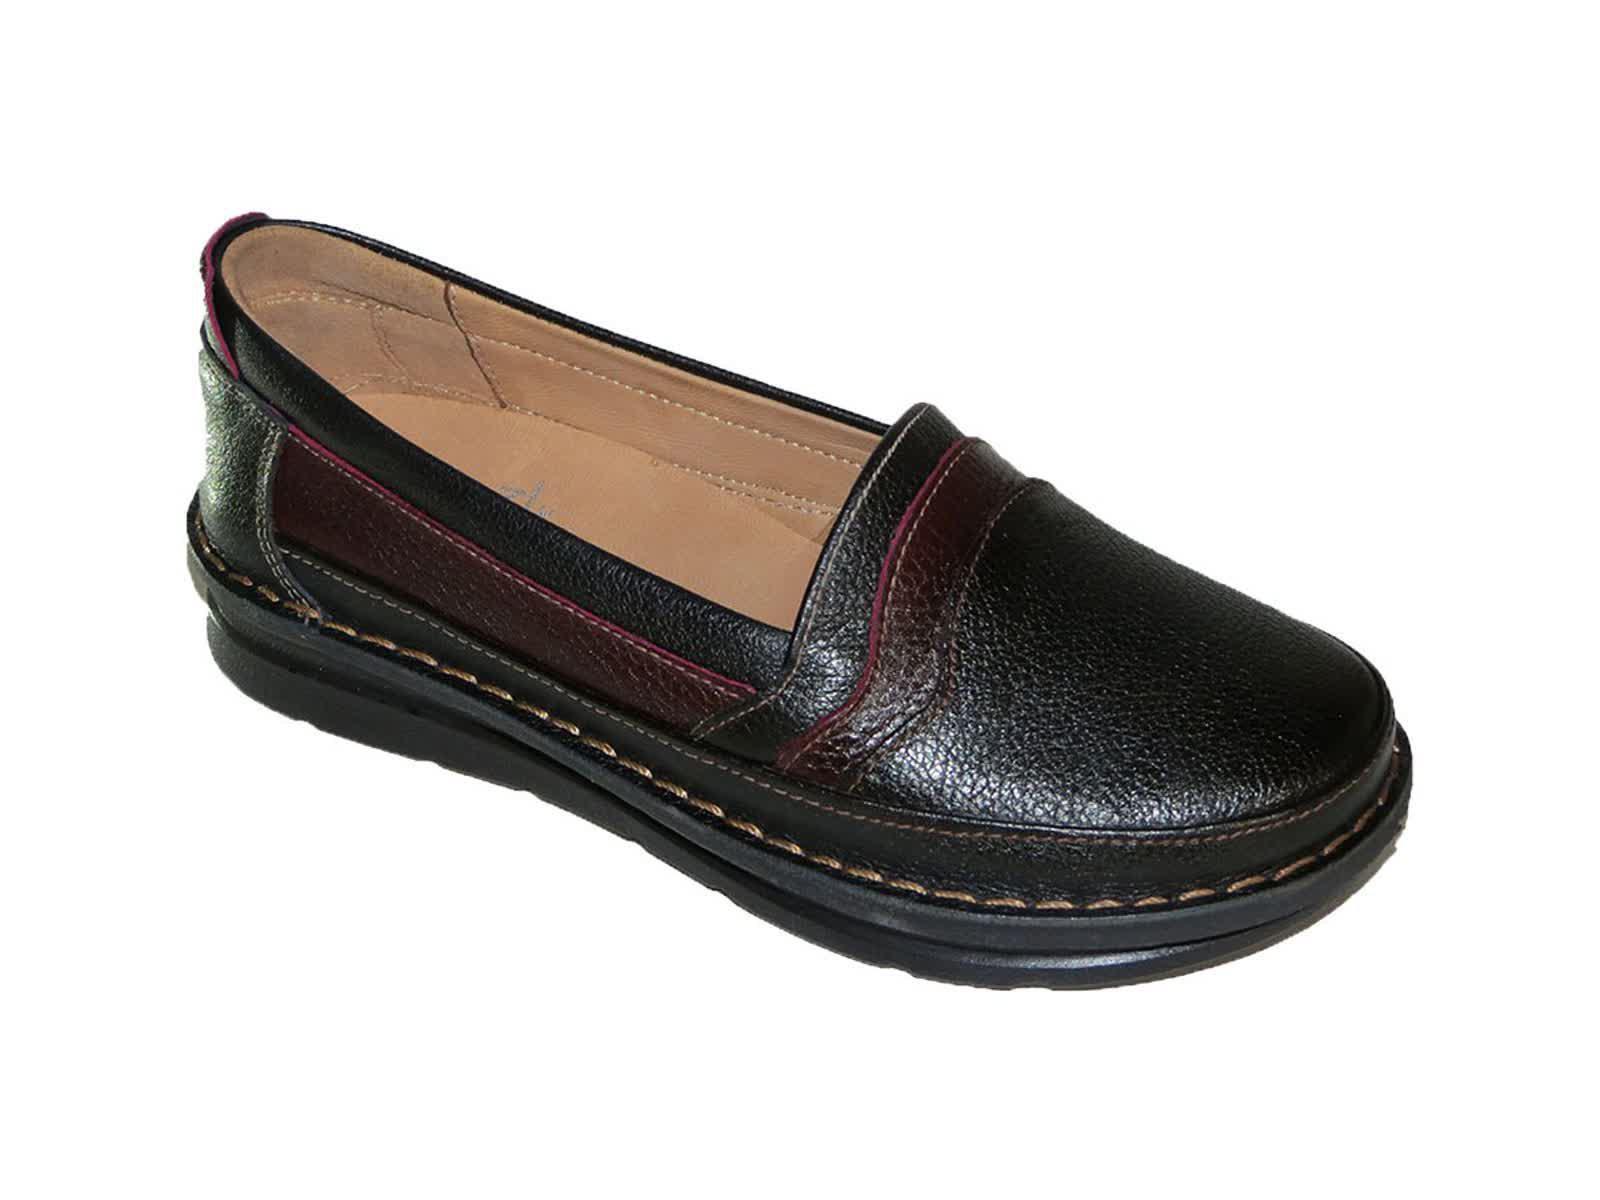 کفش کلارک زنانه مدل آنیل مشکی زرشکی